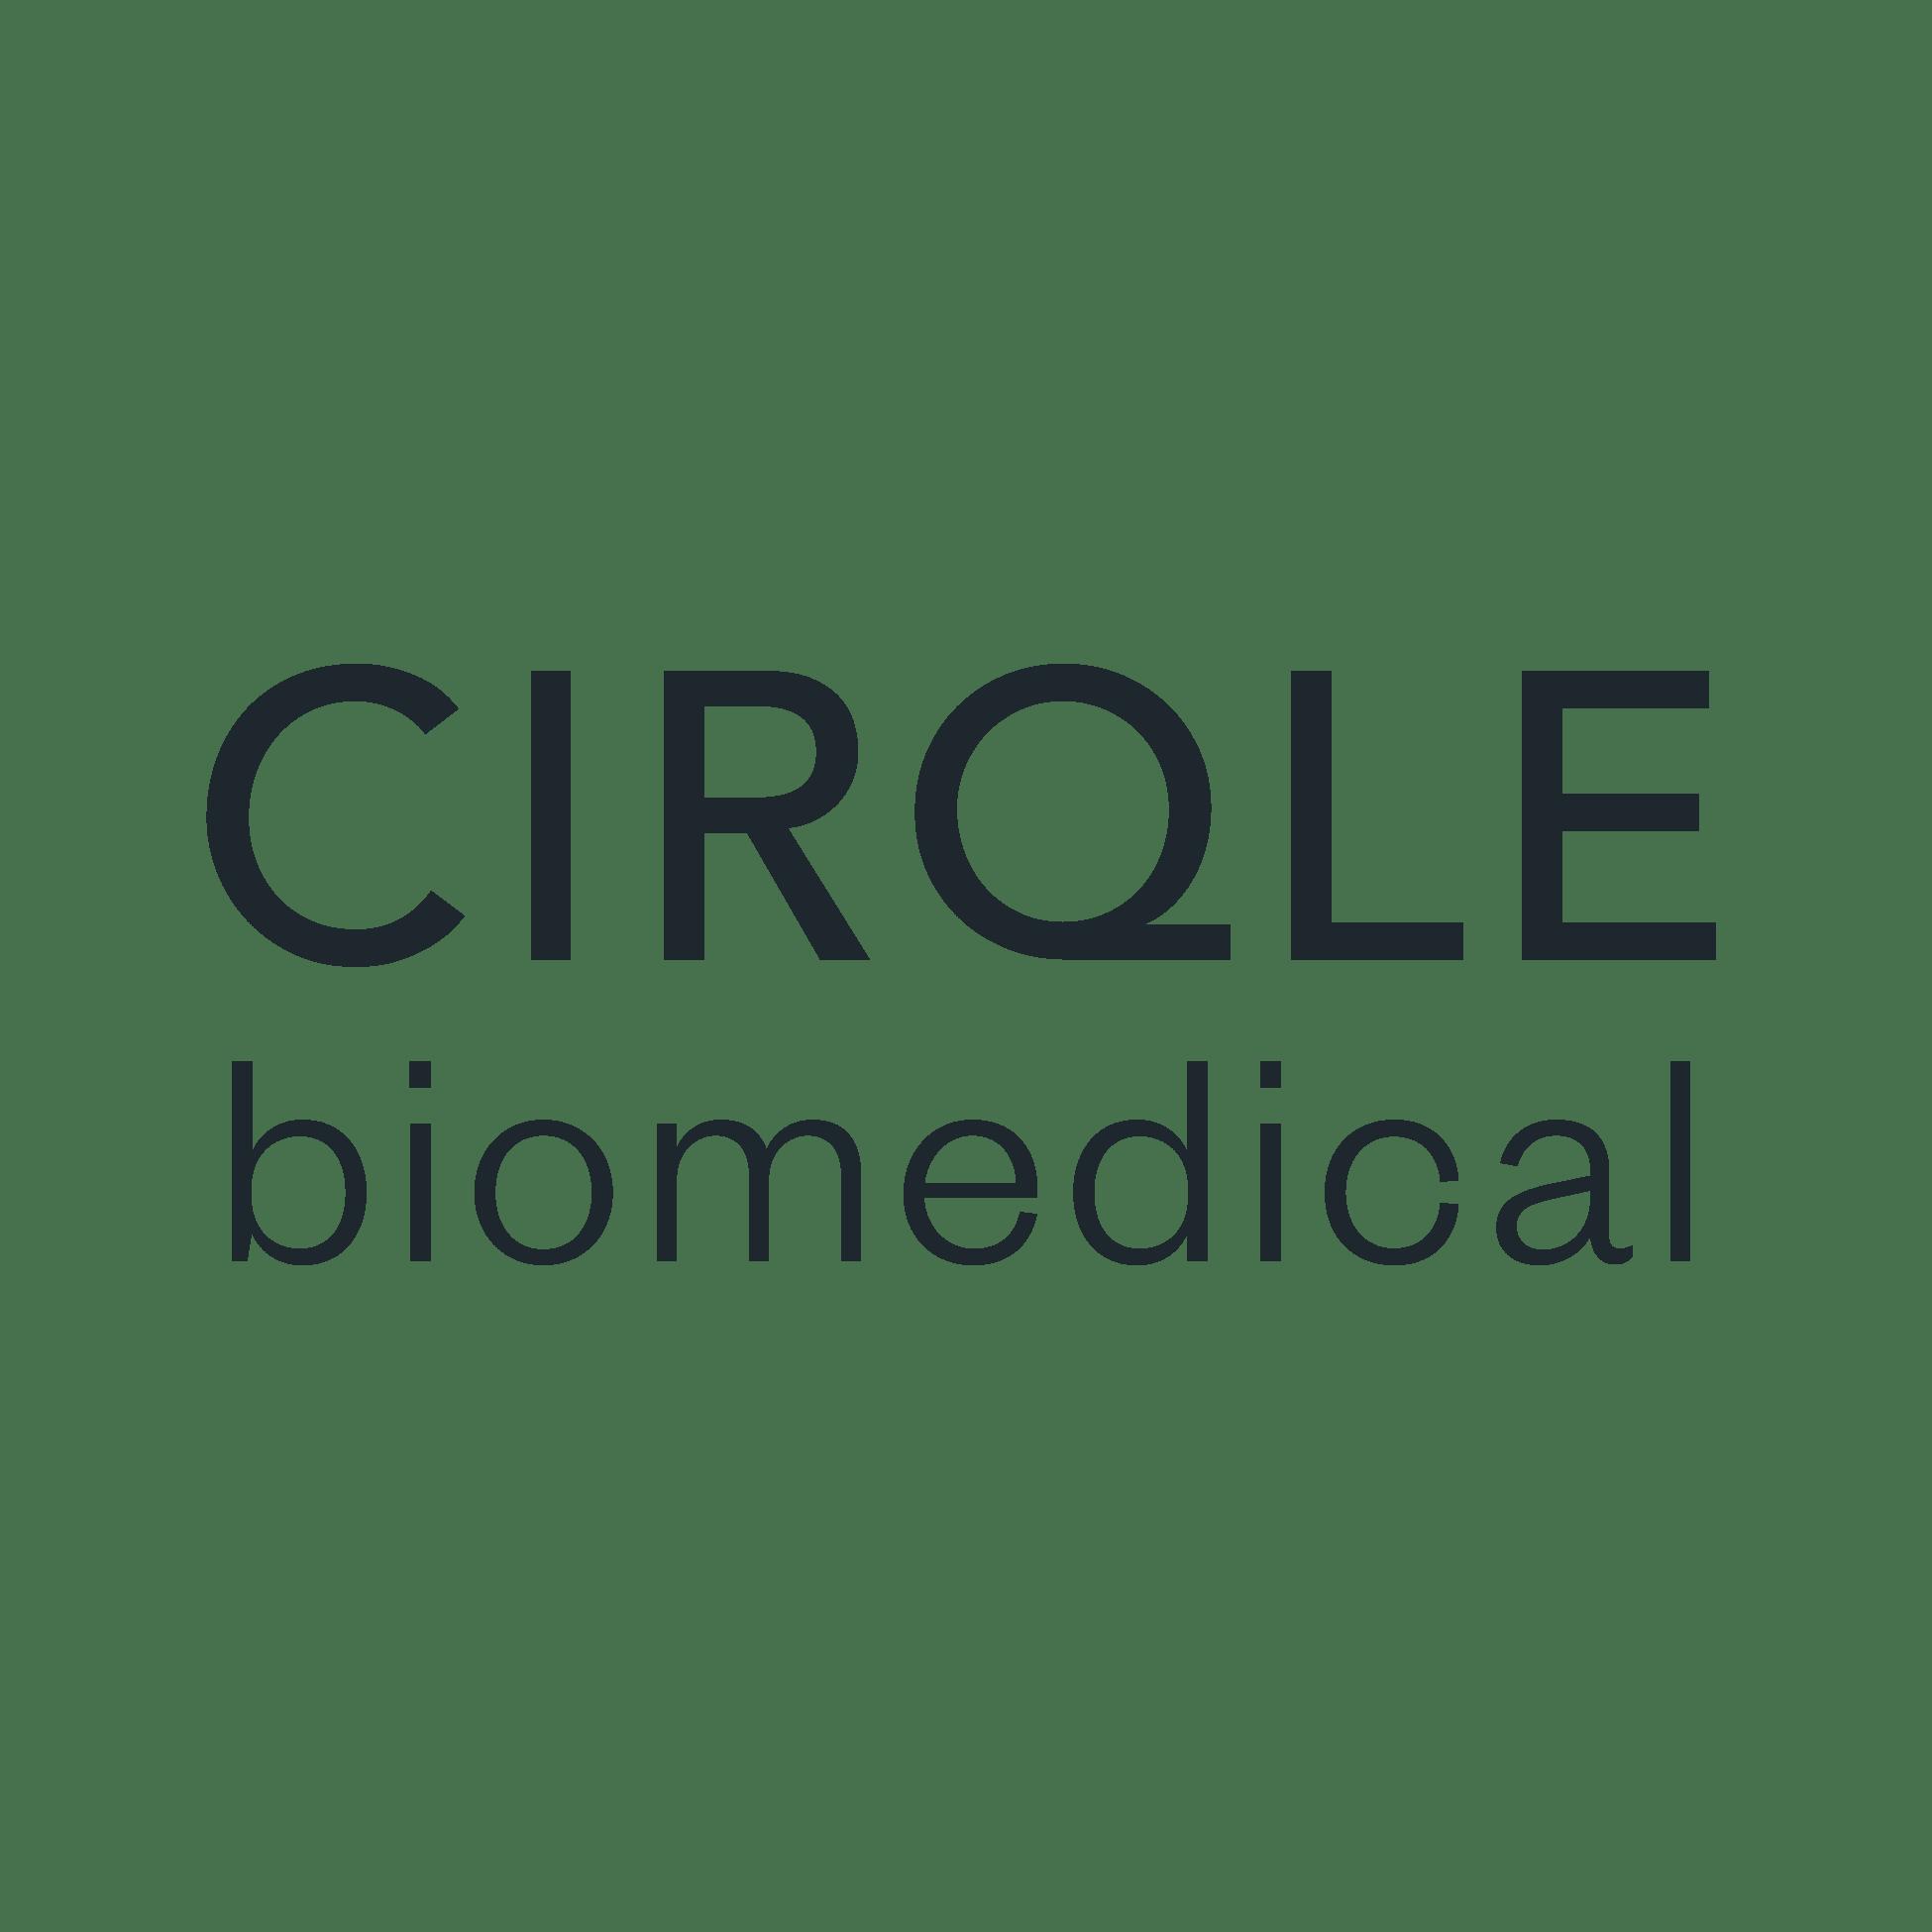 Cirqle Biomedical